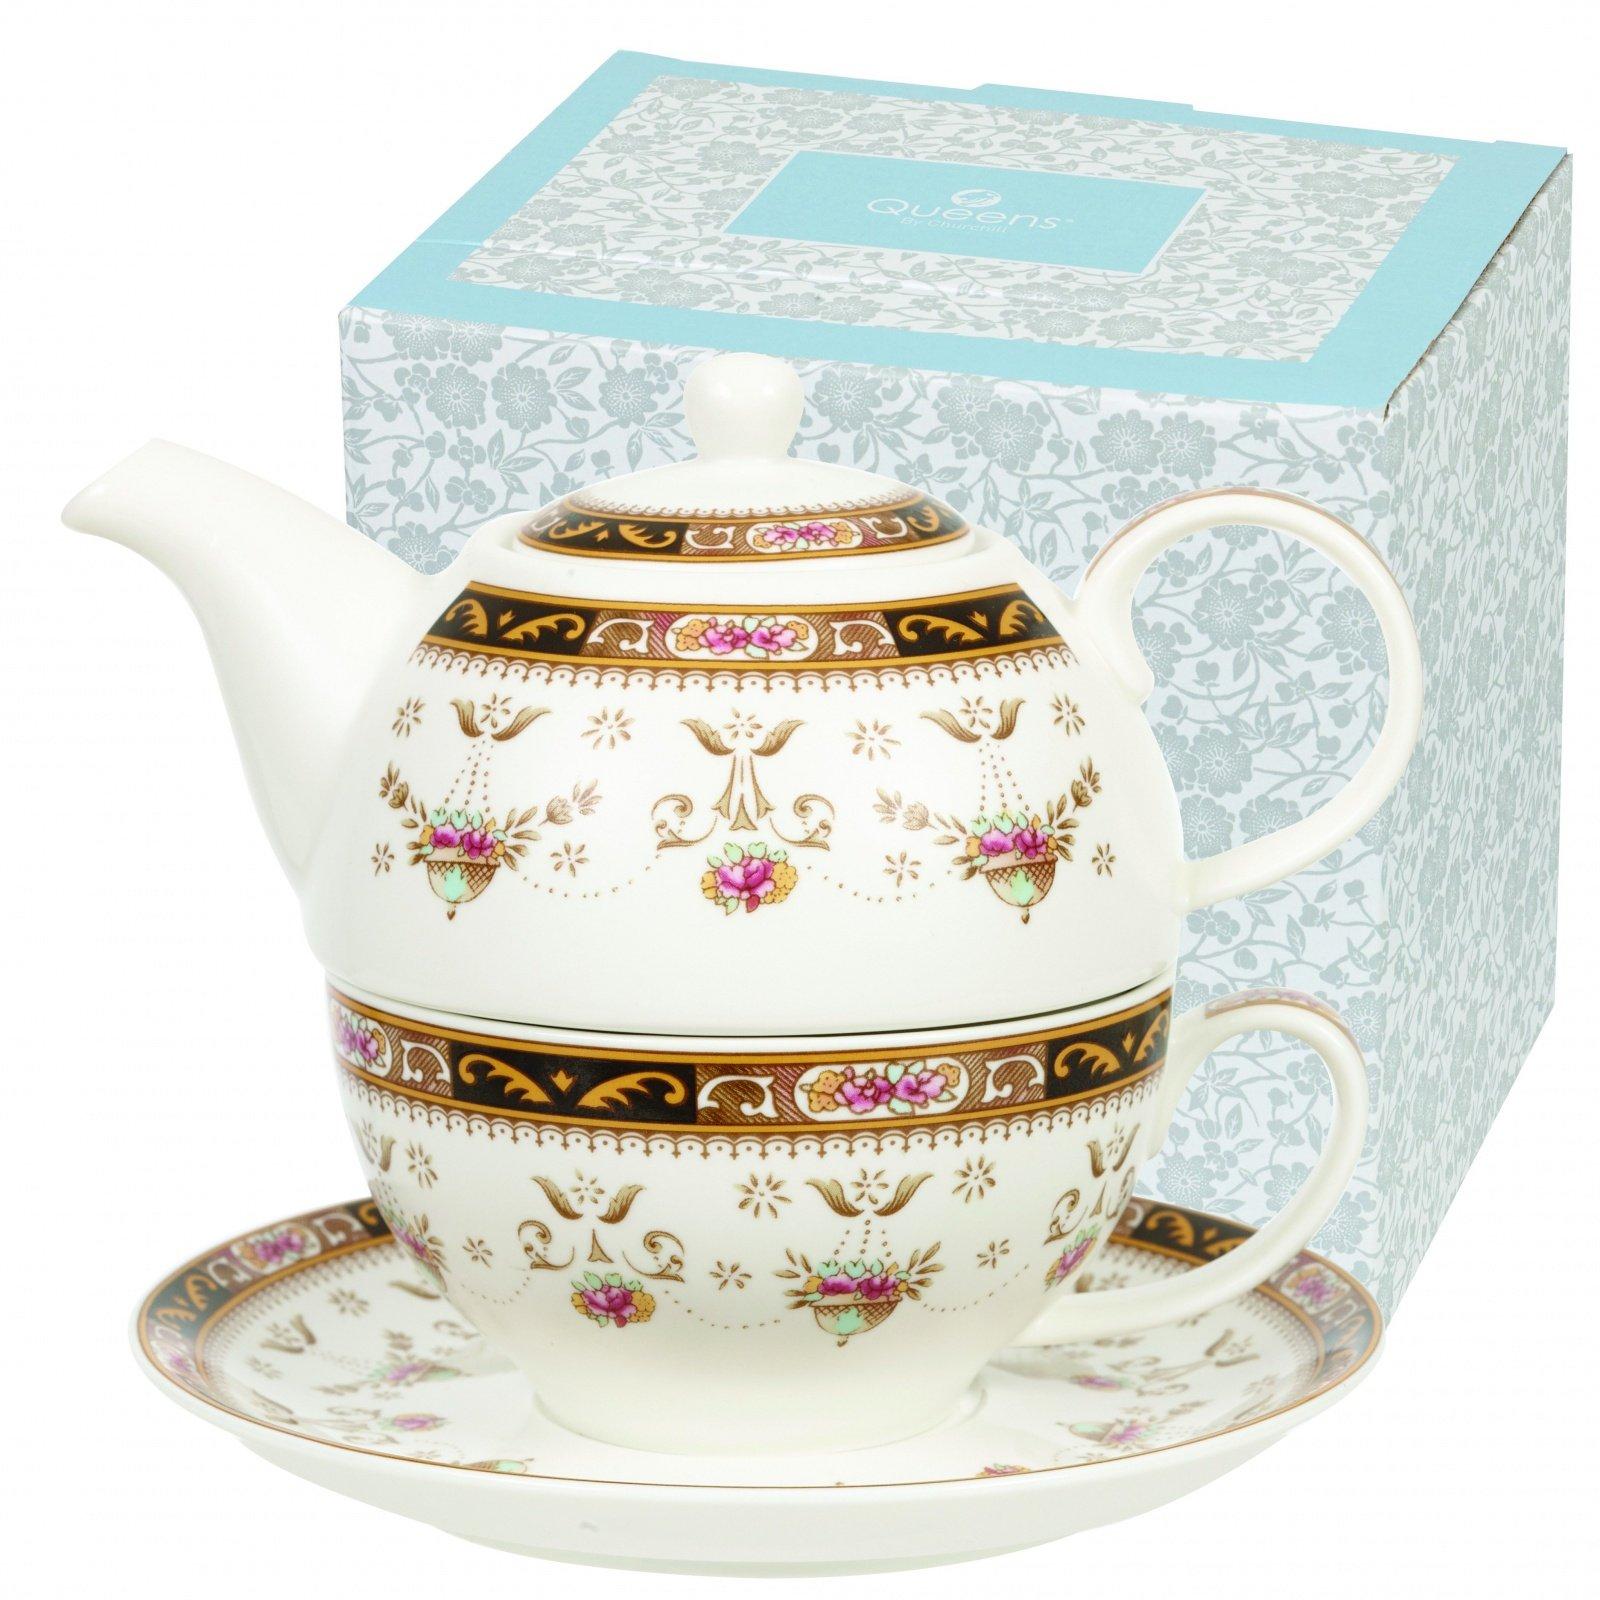 "Набор Churchill ""Англия"" 3 предмета: кружка 220мл, чайник 400мл, блюдце, Классик"